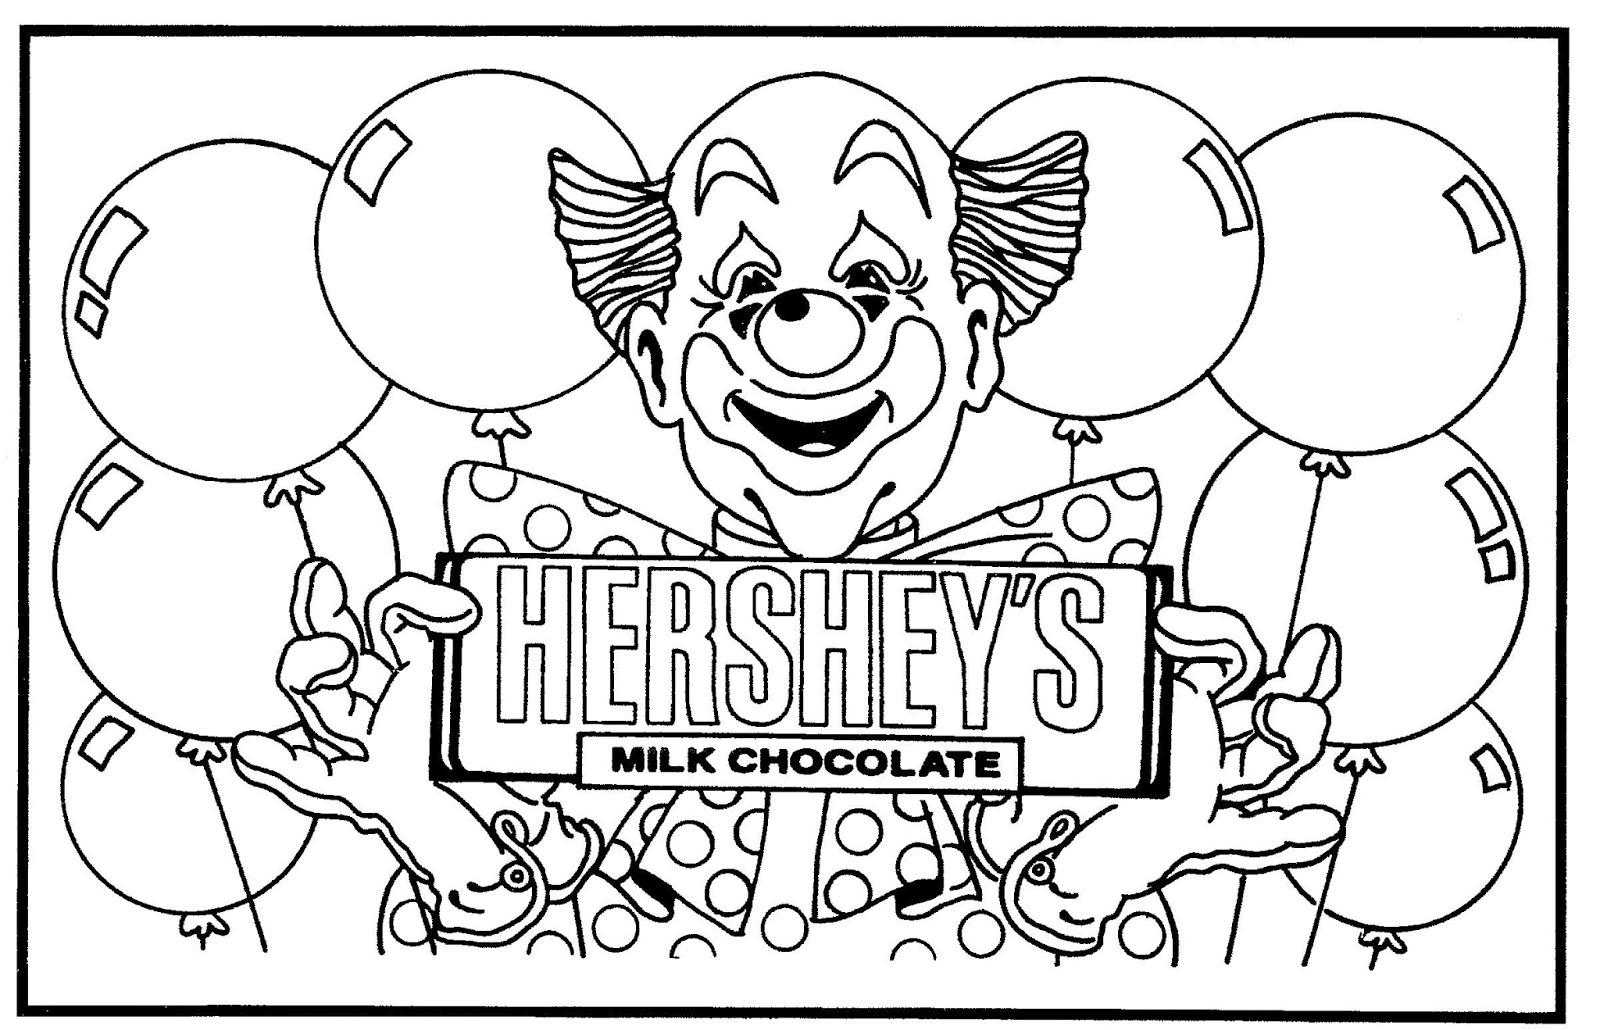 Hearshy Bar Pieces